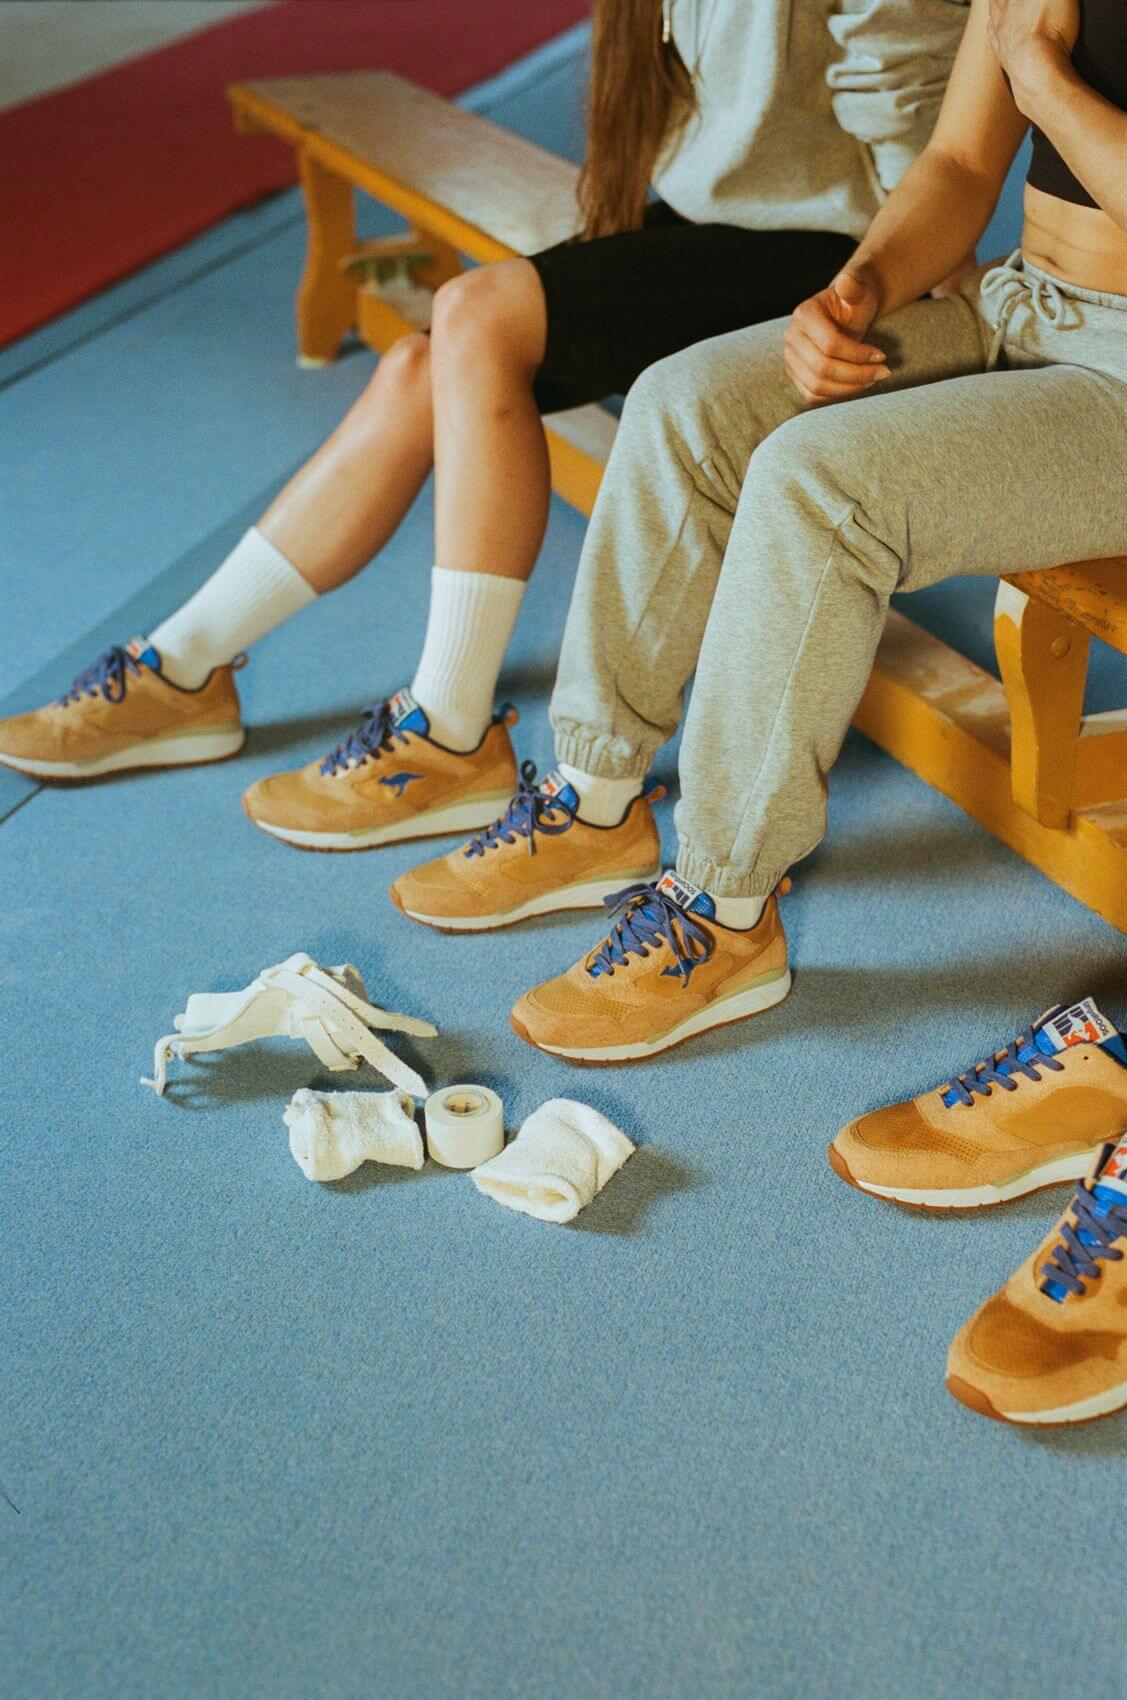 on feet photos of the KangaROOS x DTB(Deutscher Turner-Bund) - The DTB - brown/blue